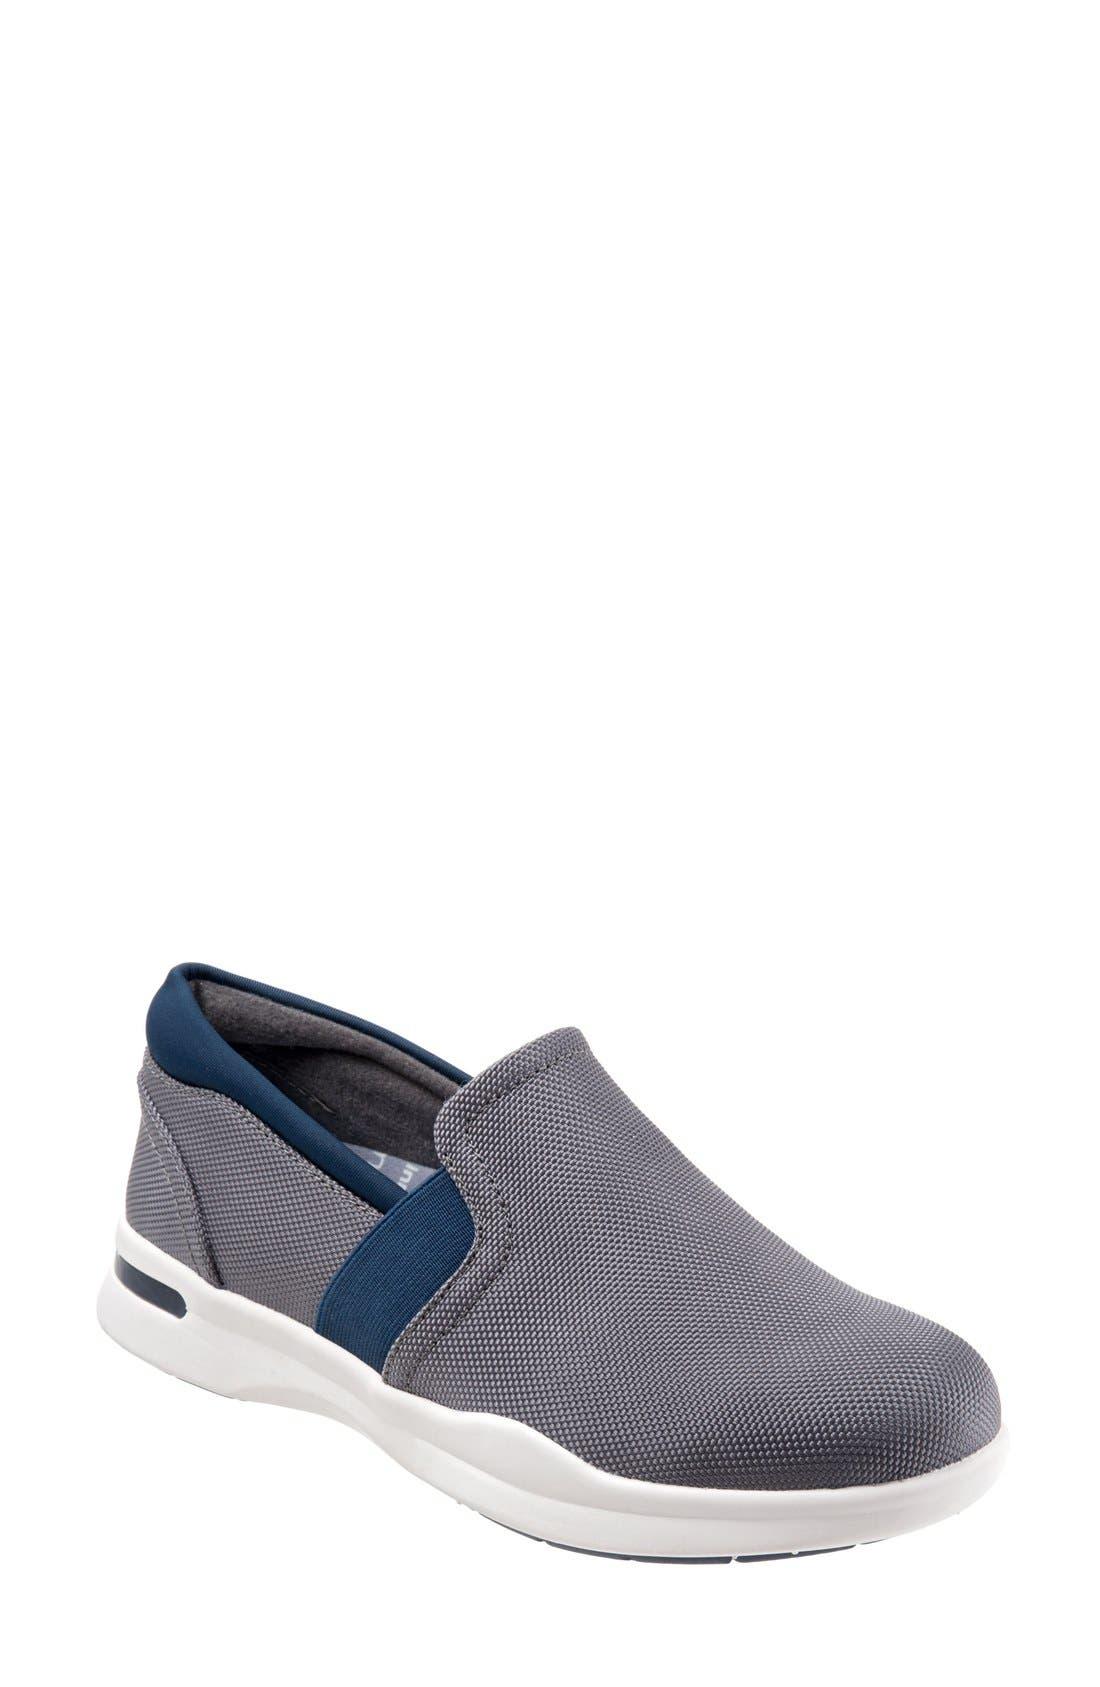 'Vantage' Slip-On Sneaker,                         Main,                         color, Grey-Navy